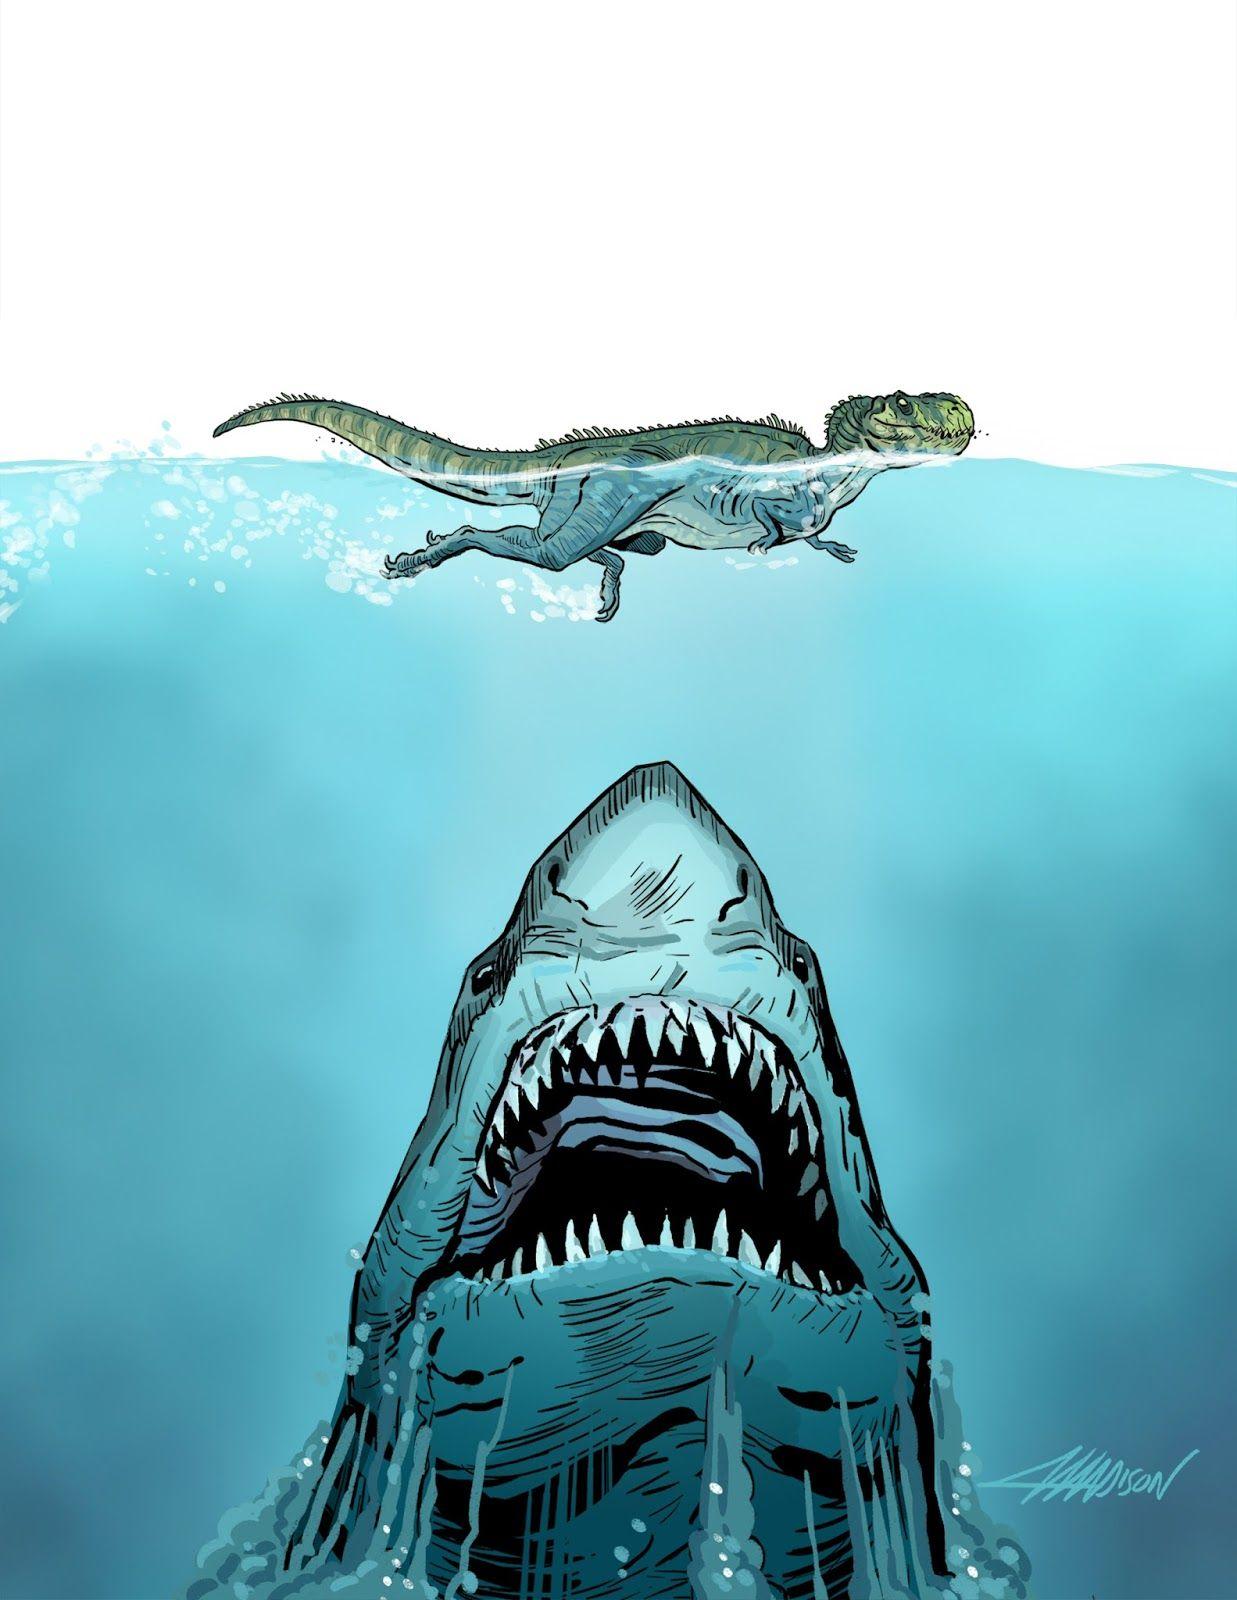 megalodon shark size - HD1237×1600